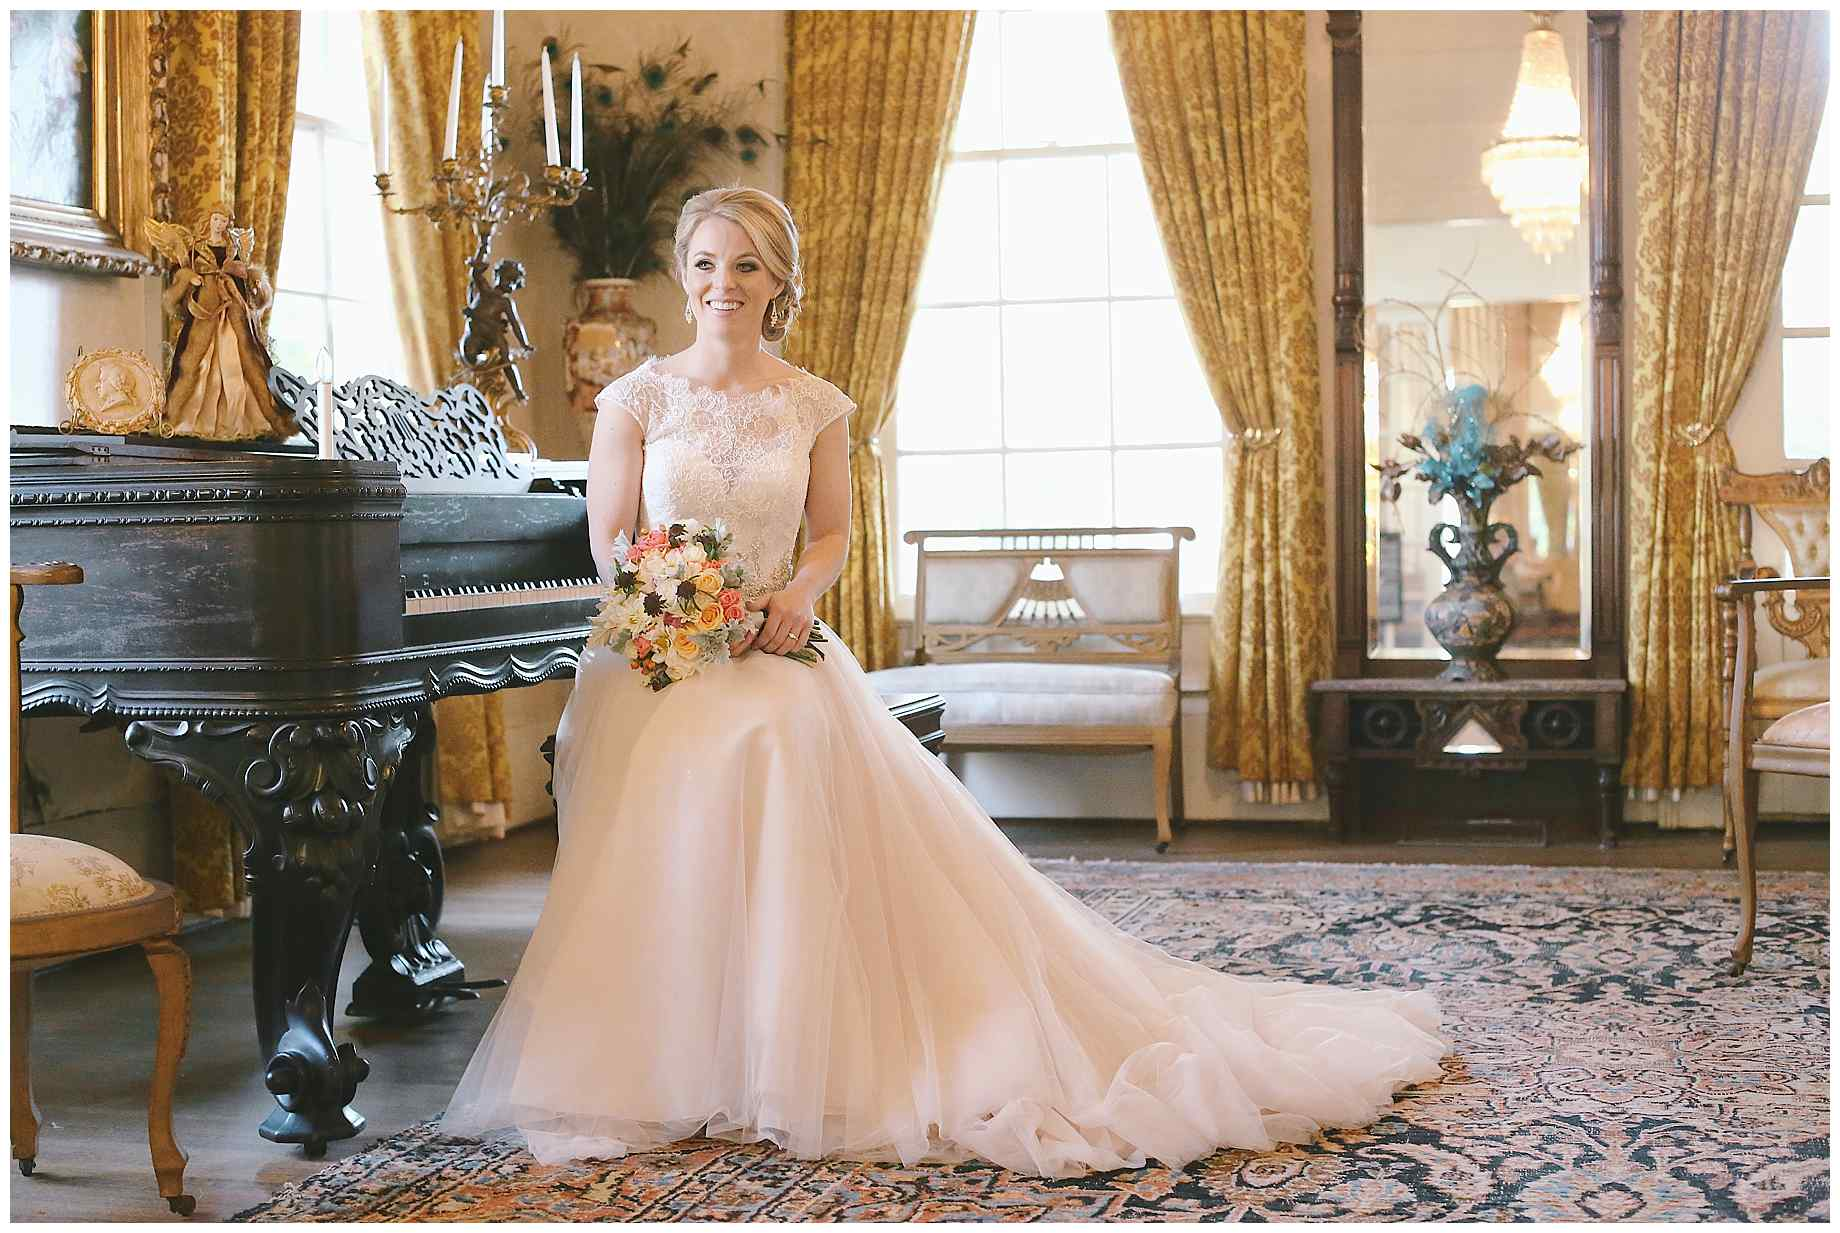 best-bride-photos-2014-009